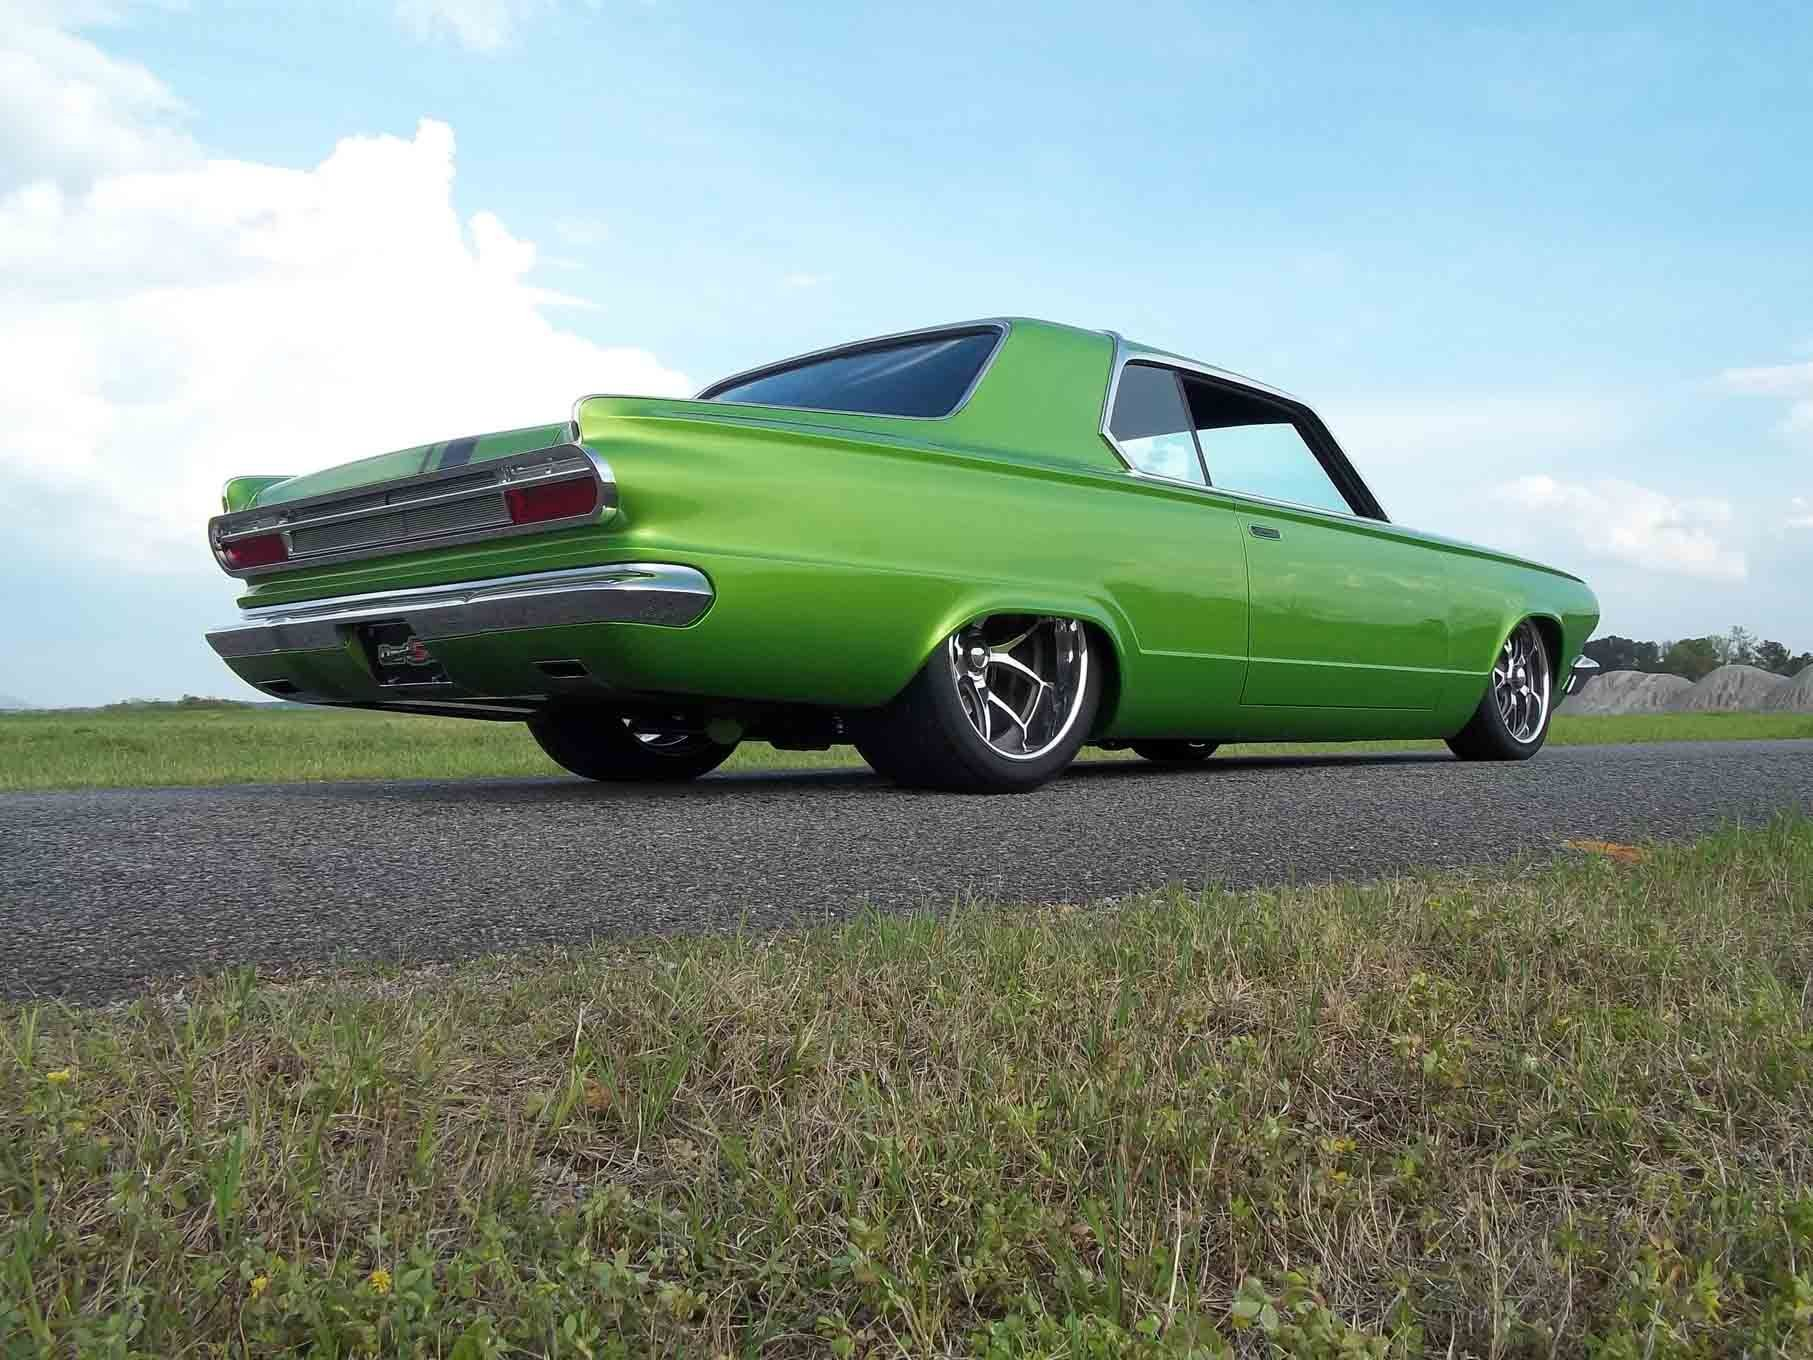 1965 dodge dart coupe hardtop street machine pro touring green usa 11 wallpaper 1813x1360 761600 wallpaperup